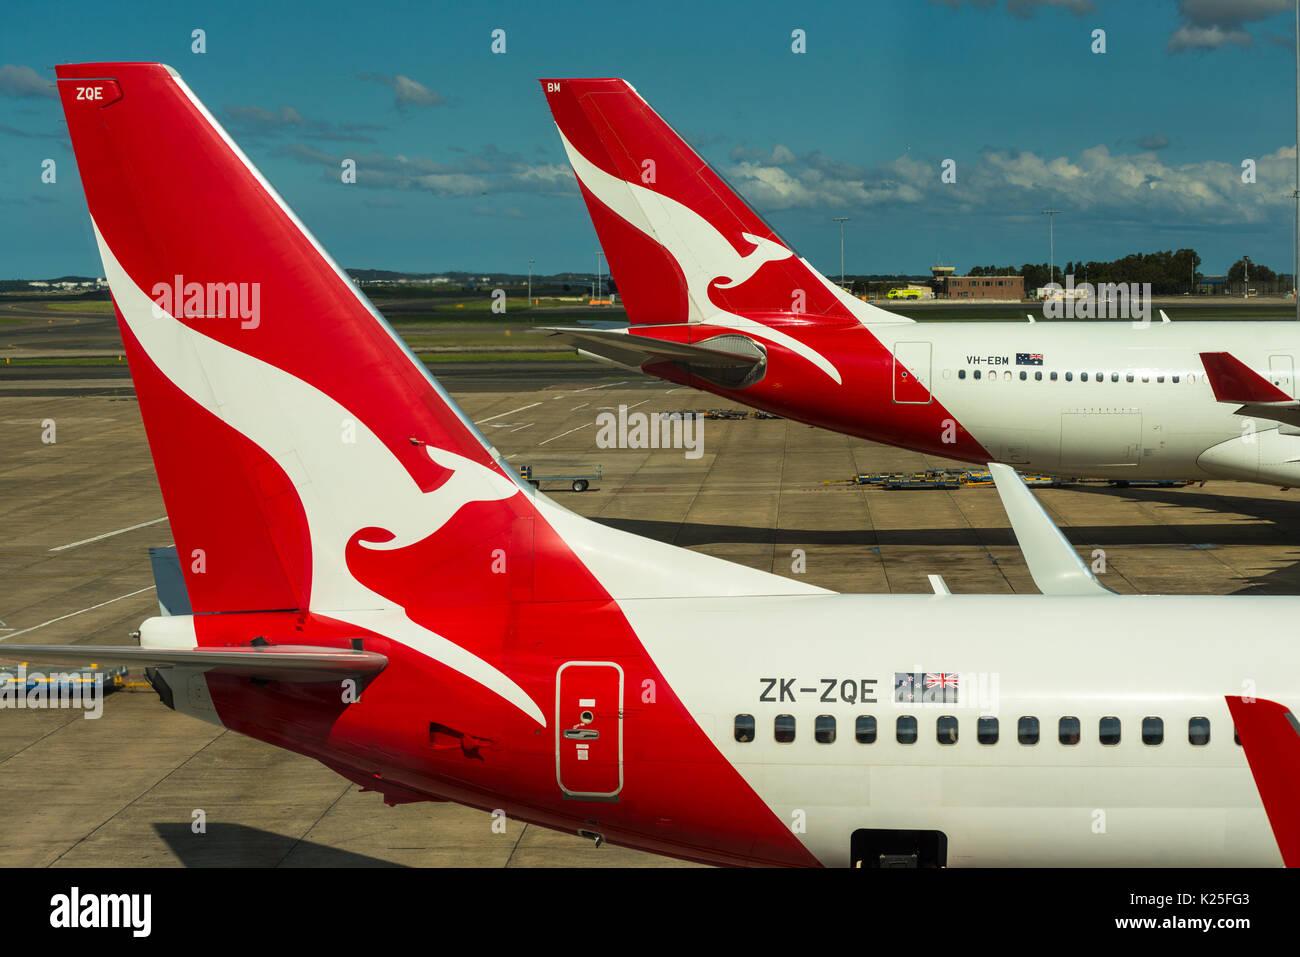 Qantas passenger aircraft tails with distinctive kangaroo logo at Sydney International Airport, New South Wales, Stock Photo